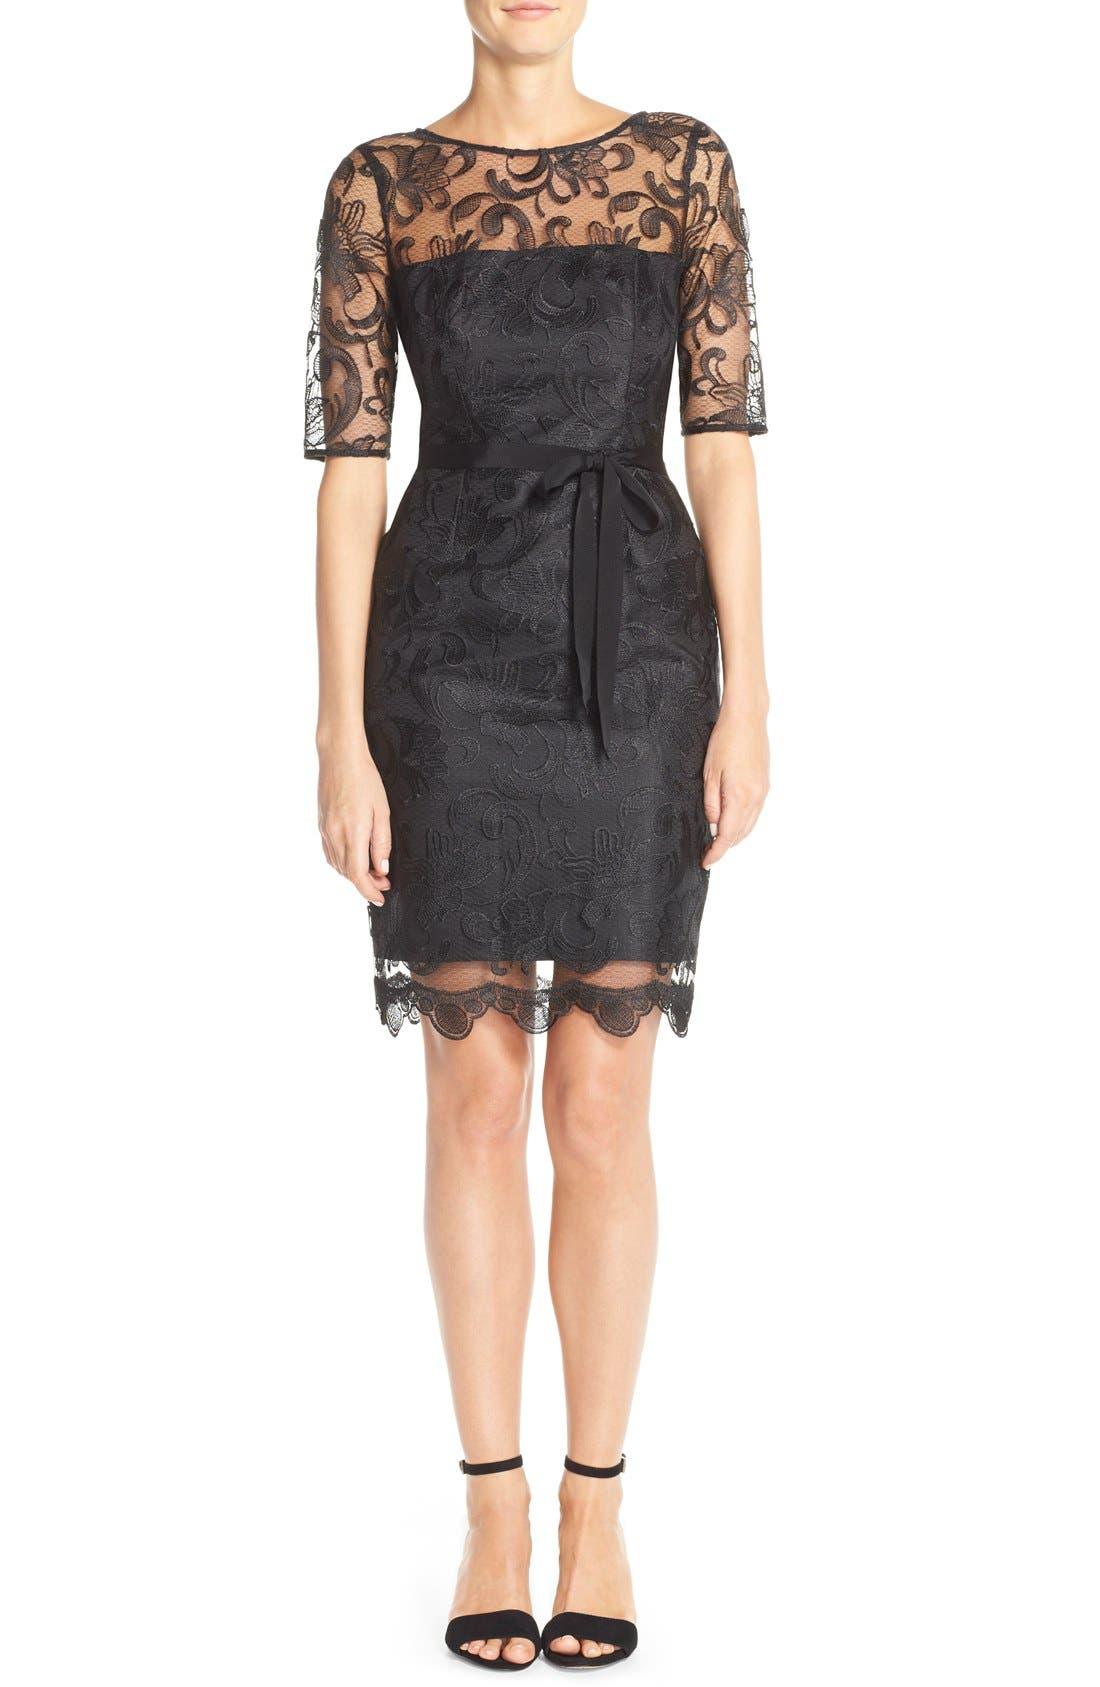 Alternate Image 1 Selected - Adrianna Papell Illusion Yoke Lace Sheath Dress